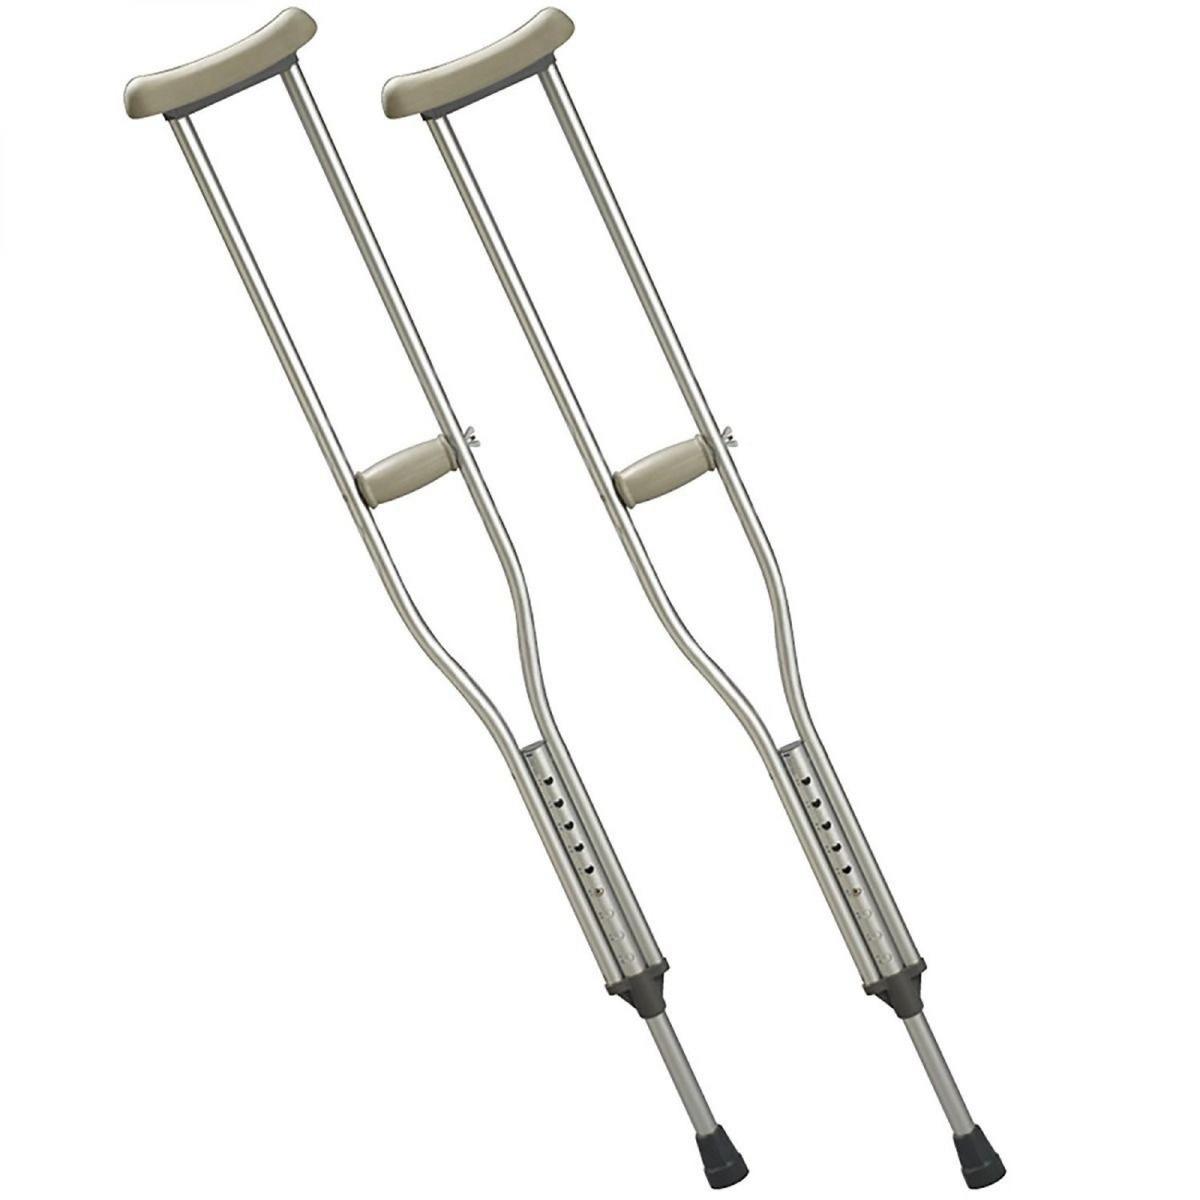 Standard Underarm Crutches